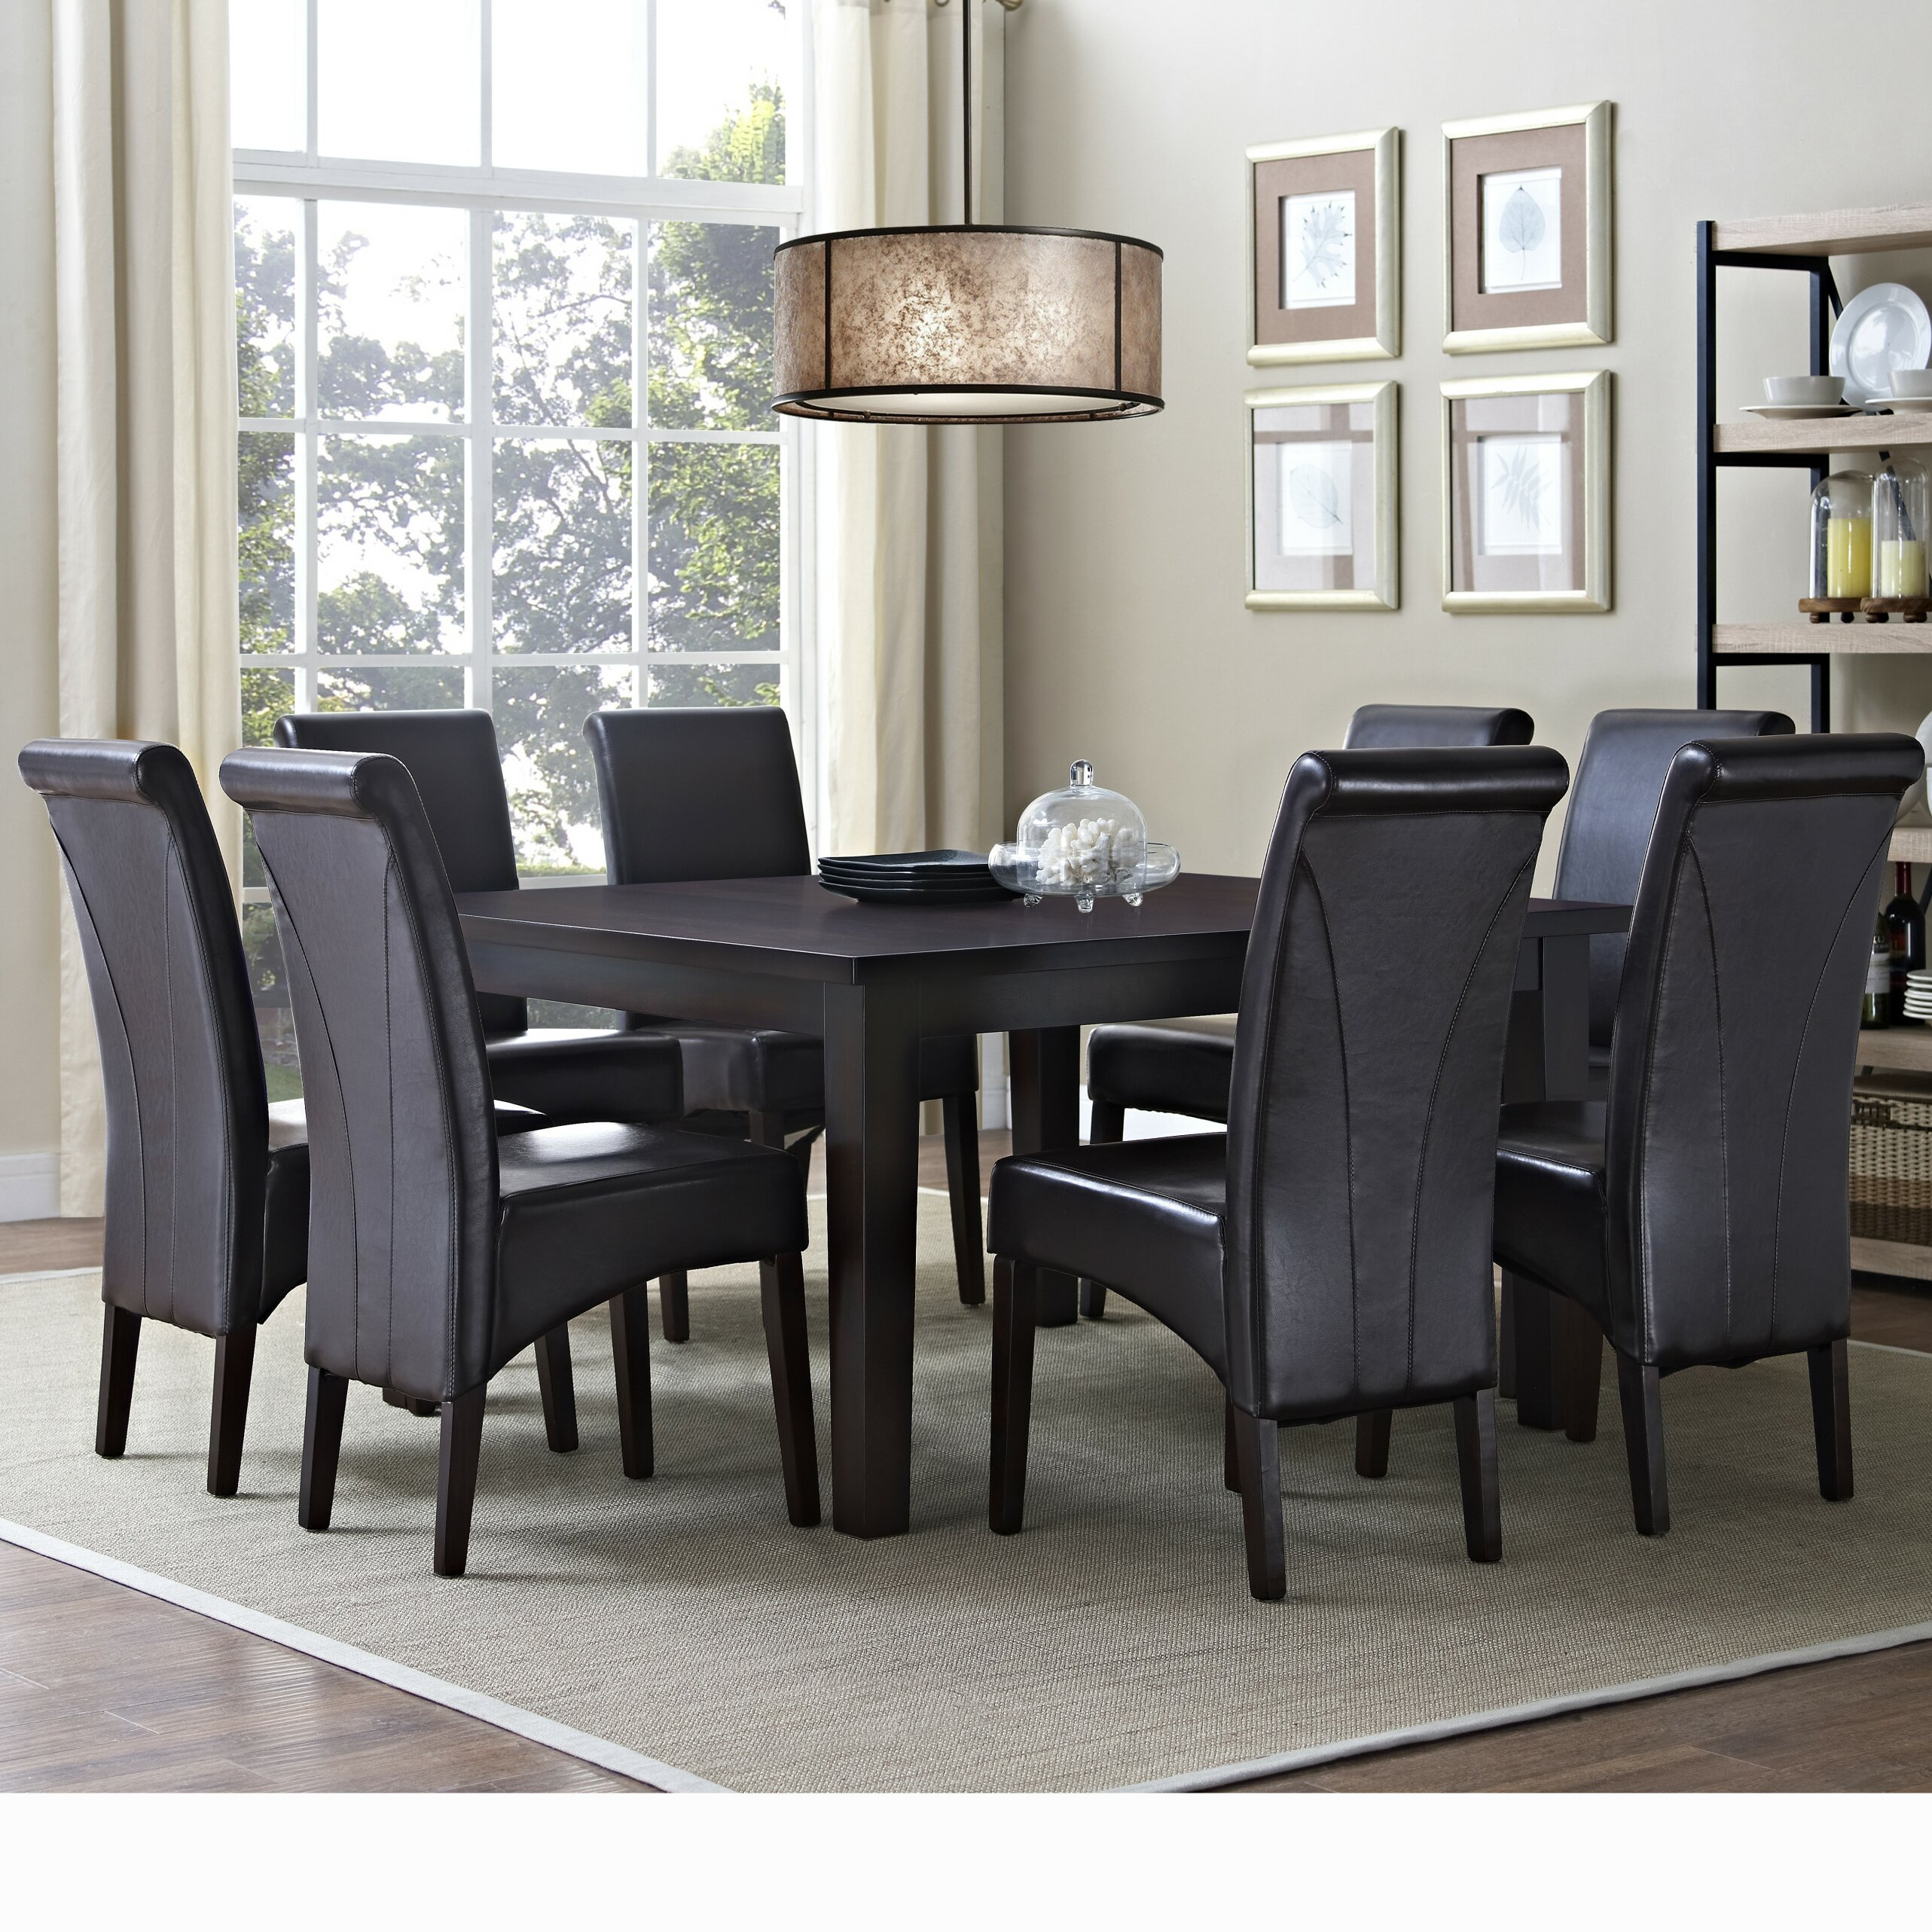 simpli home avalon 9 piece dining set wayfair. Black Bedroom Furniture Sets. Home Design Ideas